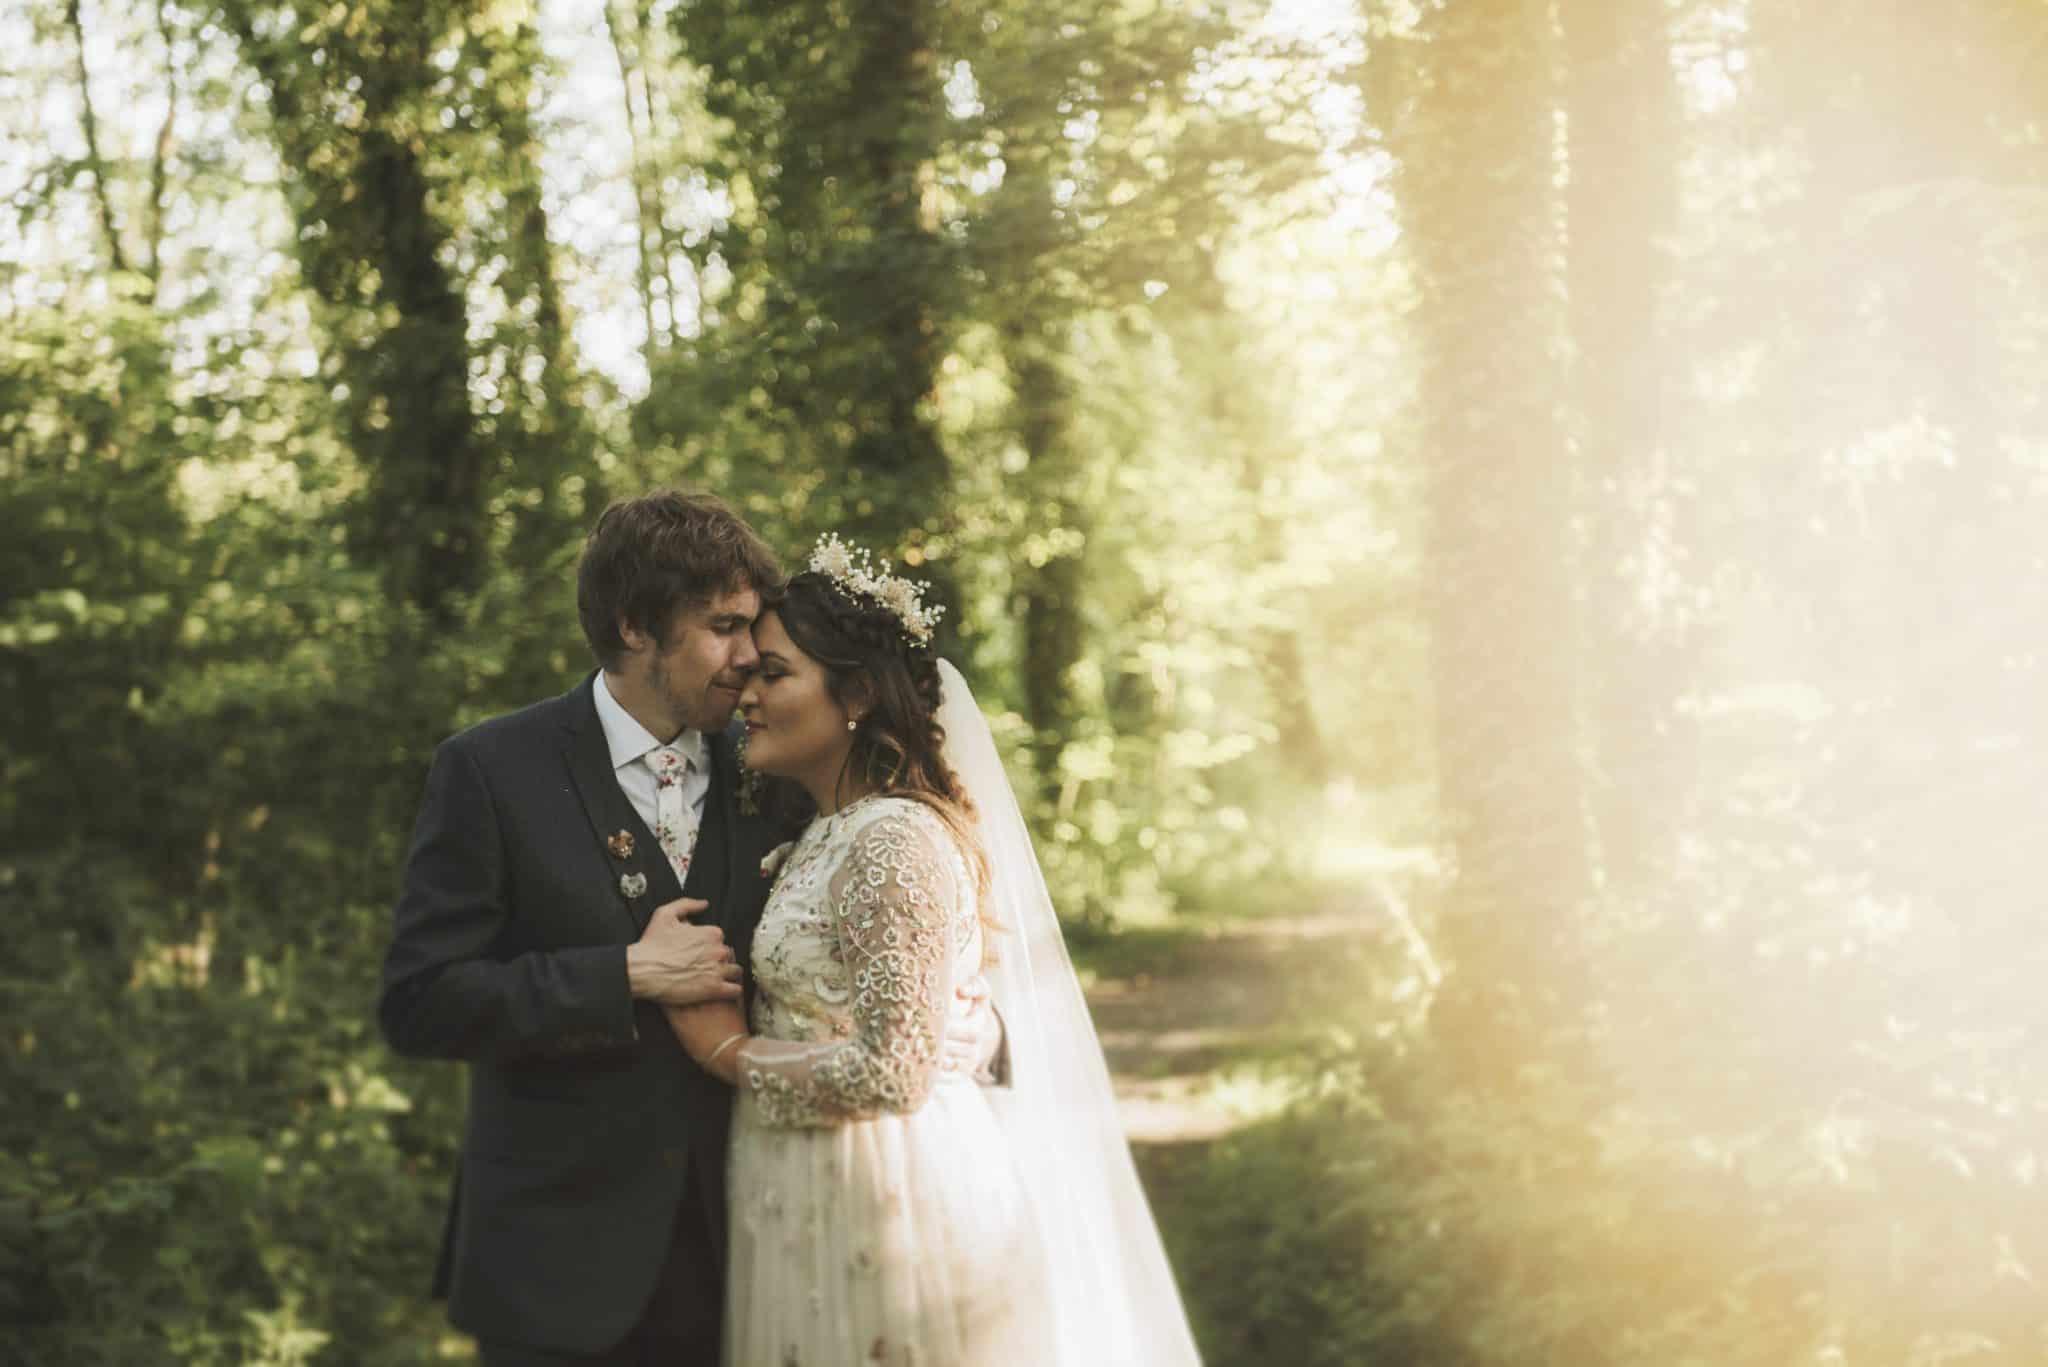 Bride & Groom embrace in woodland wedding photographers cardiff